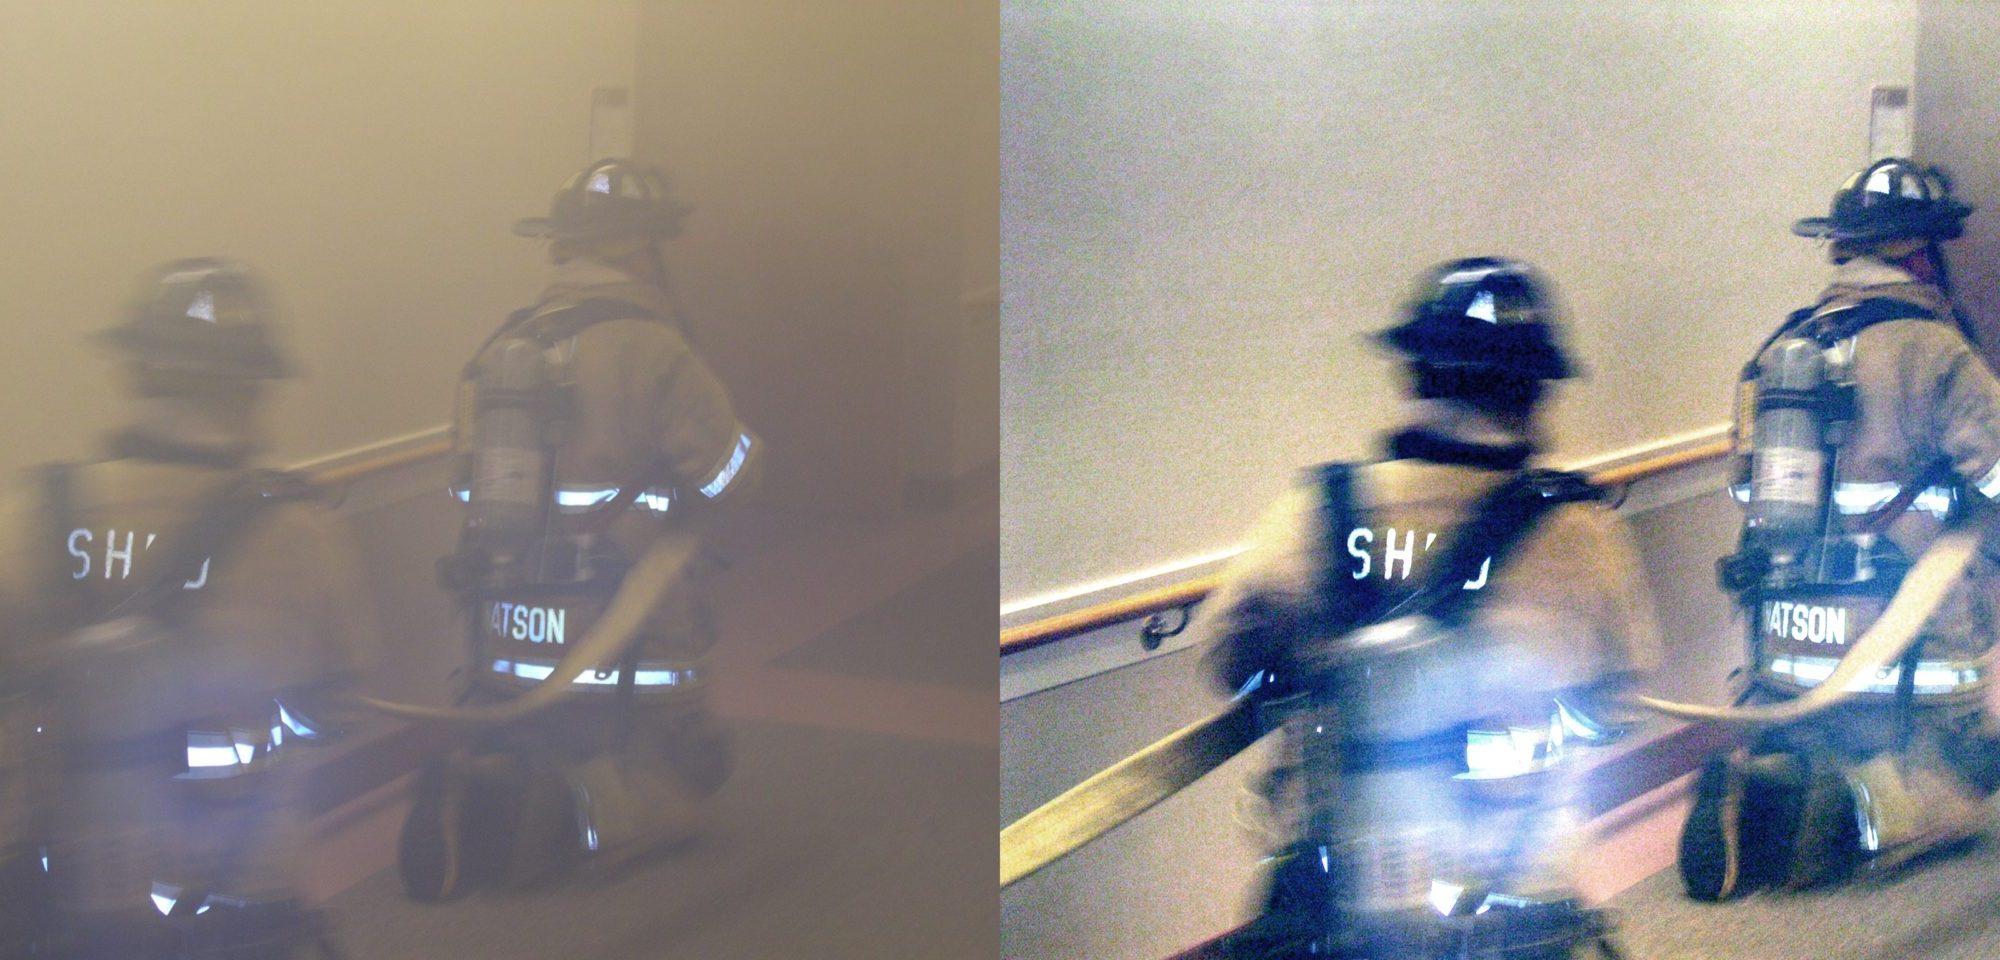 ERV scan of Fire Rescue